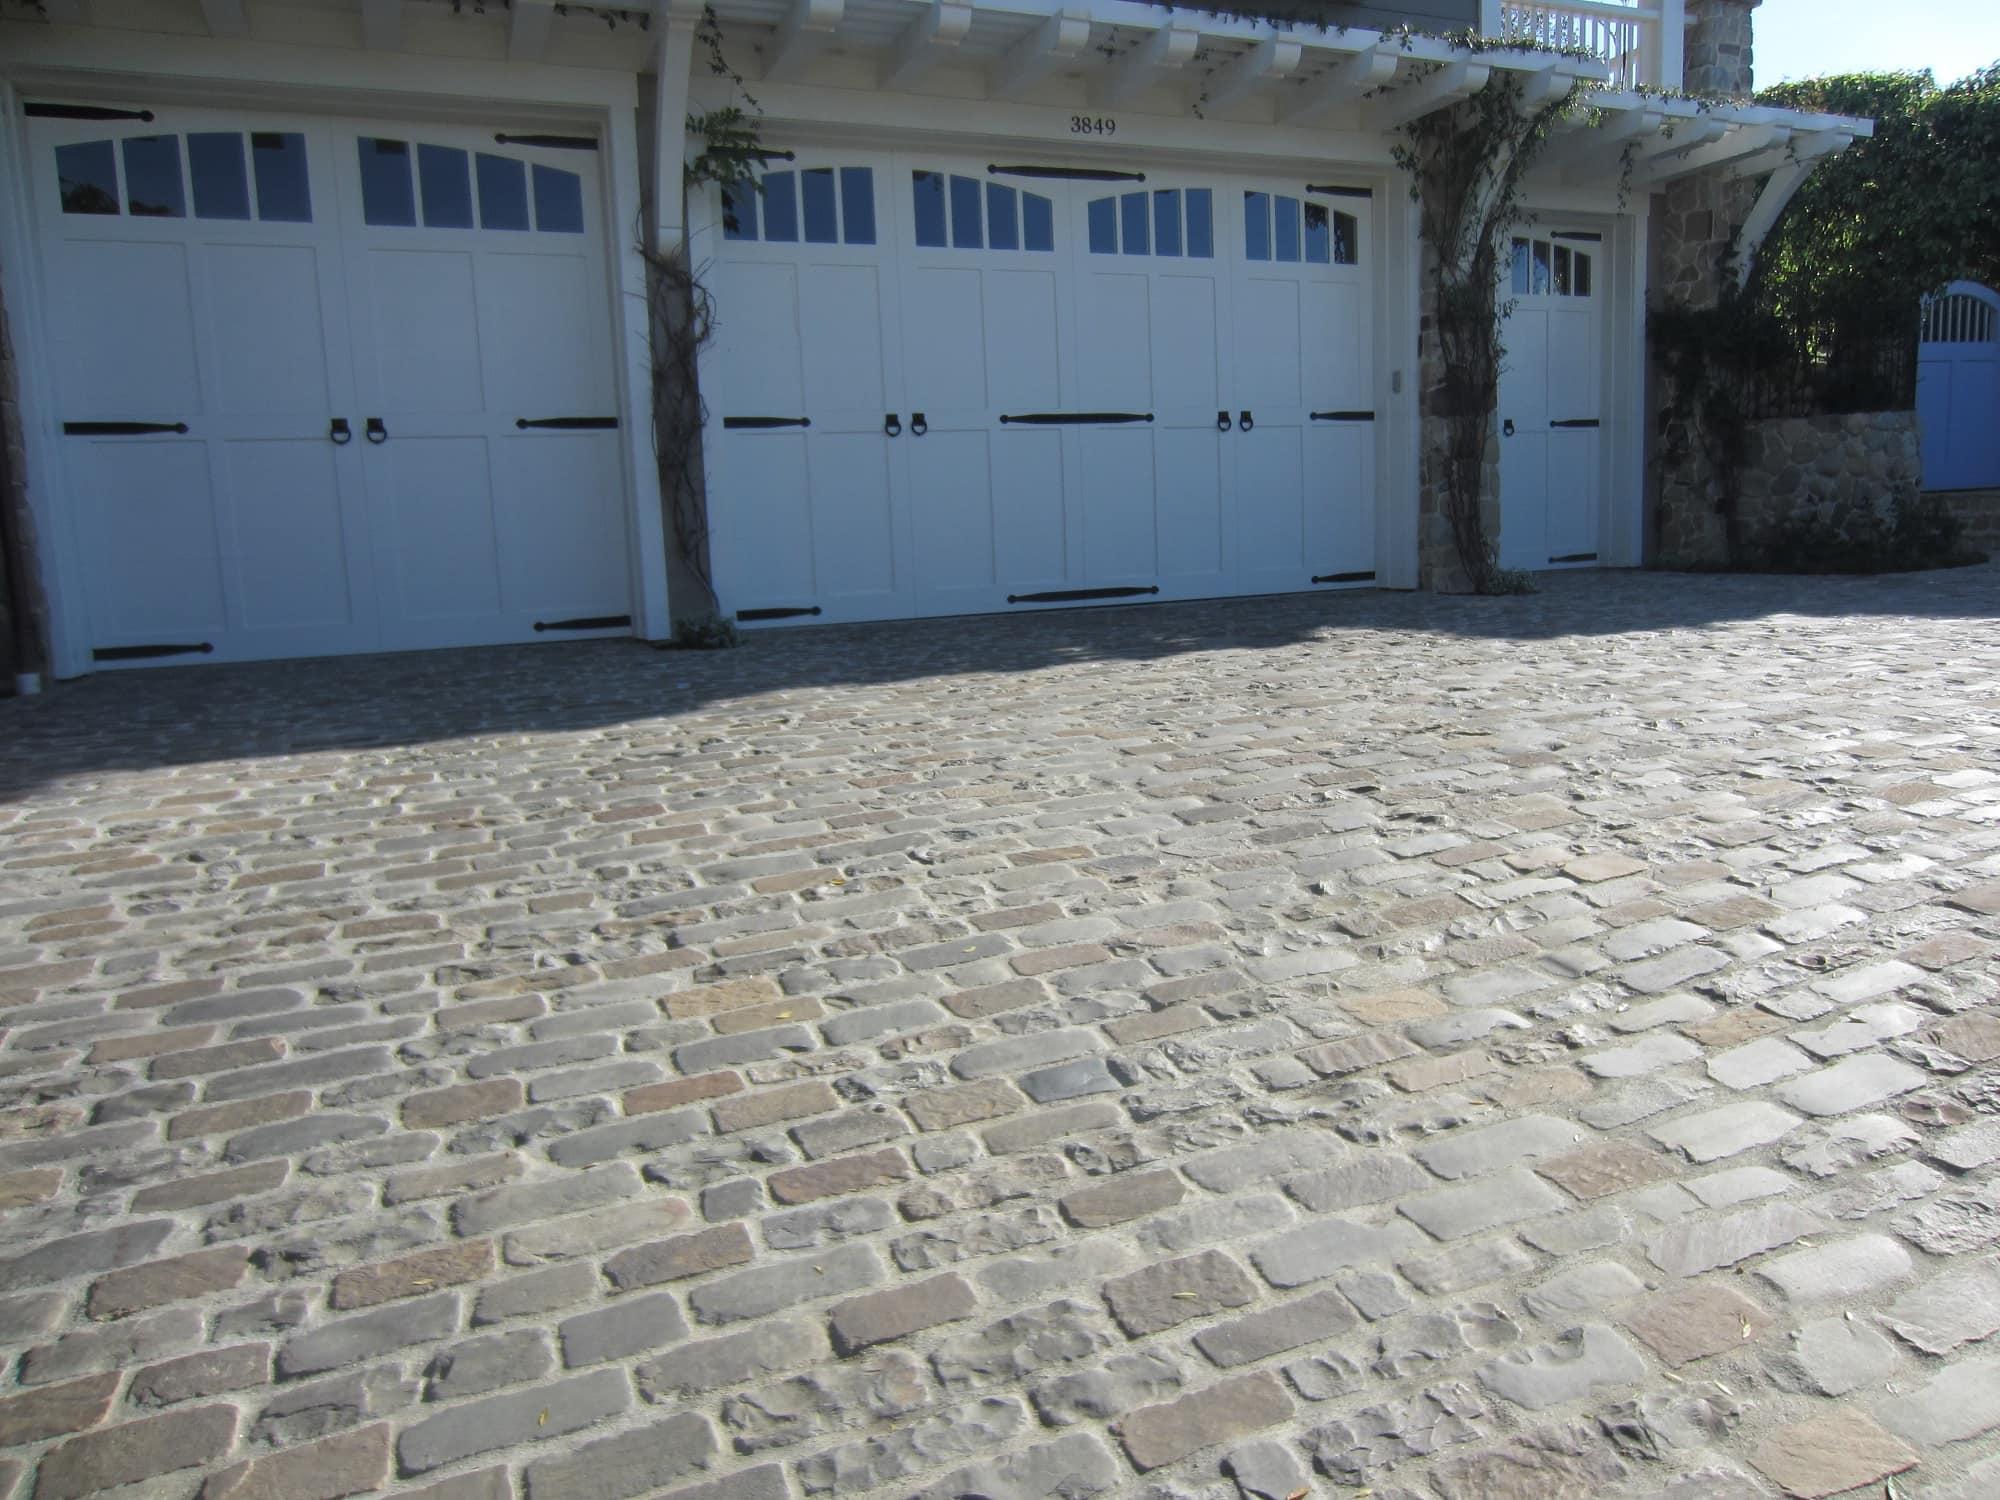 3 car garage driveway built with bluestone cobblestone brick.